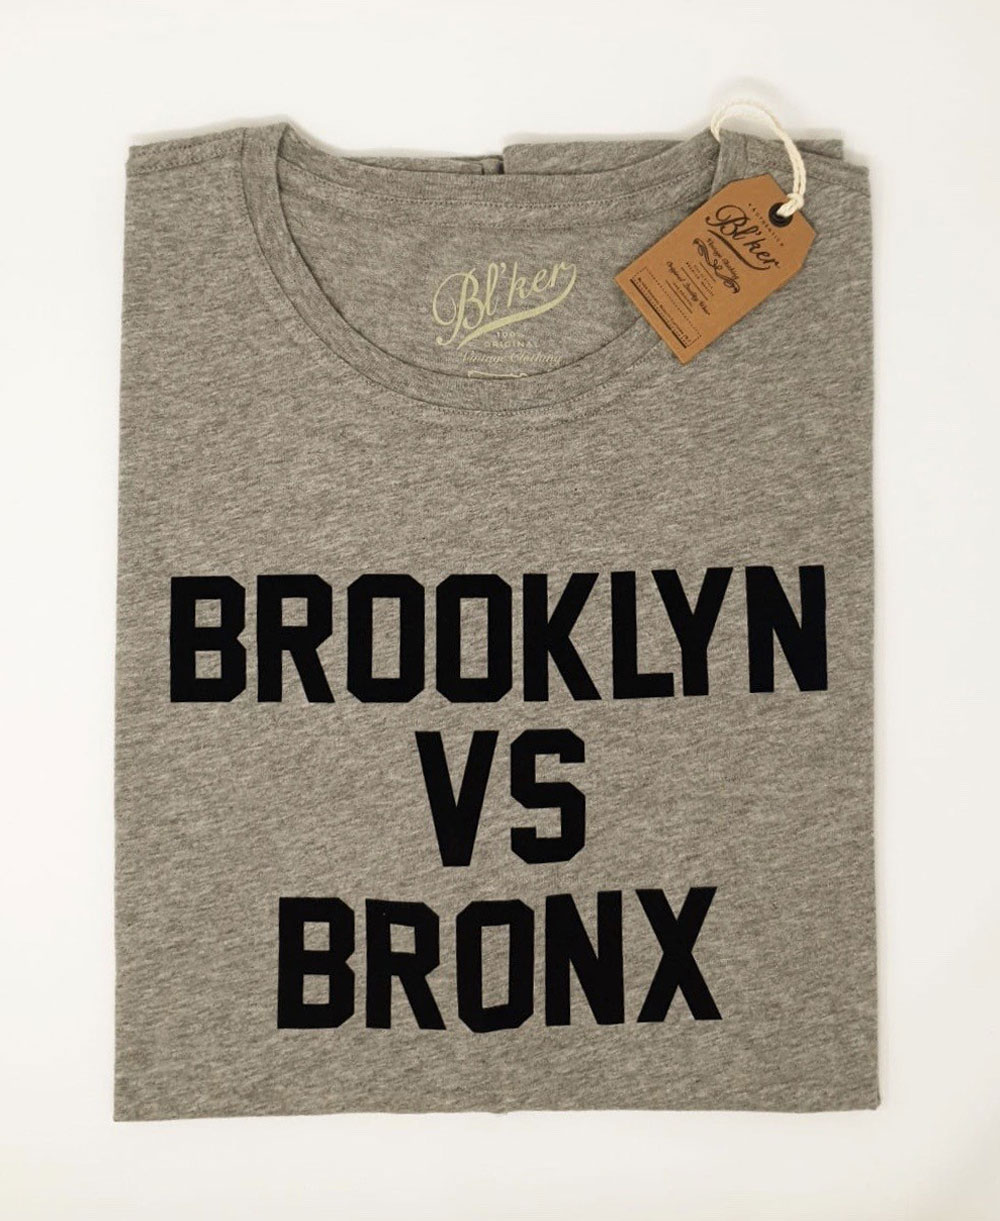 Brkln Vs Bronx Camiseta Manga Corta para Hombre Heather Grey